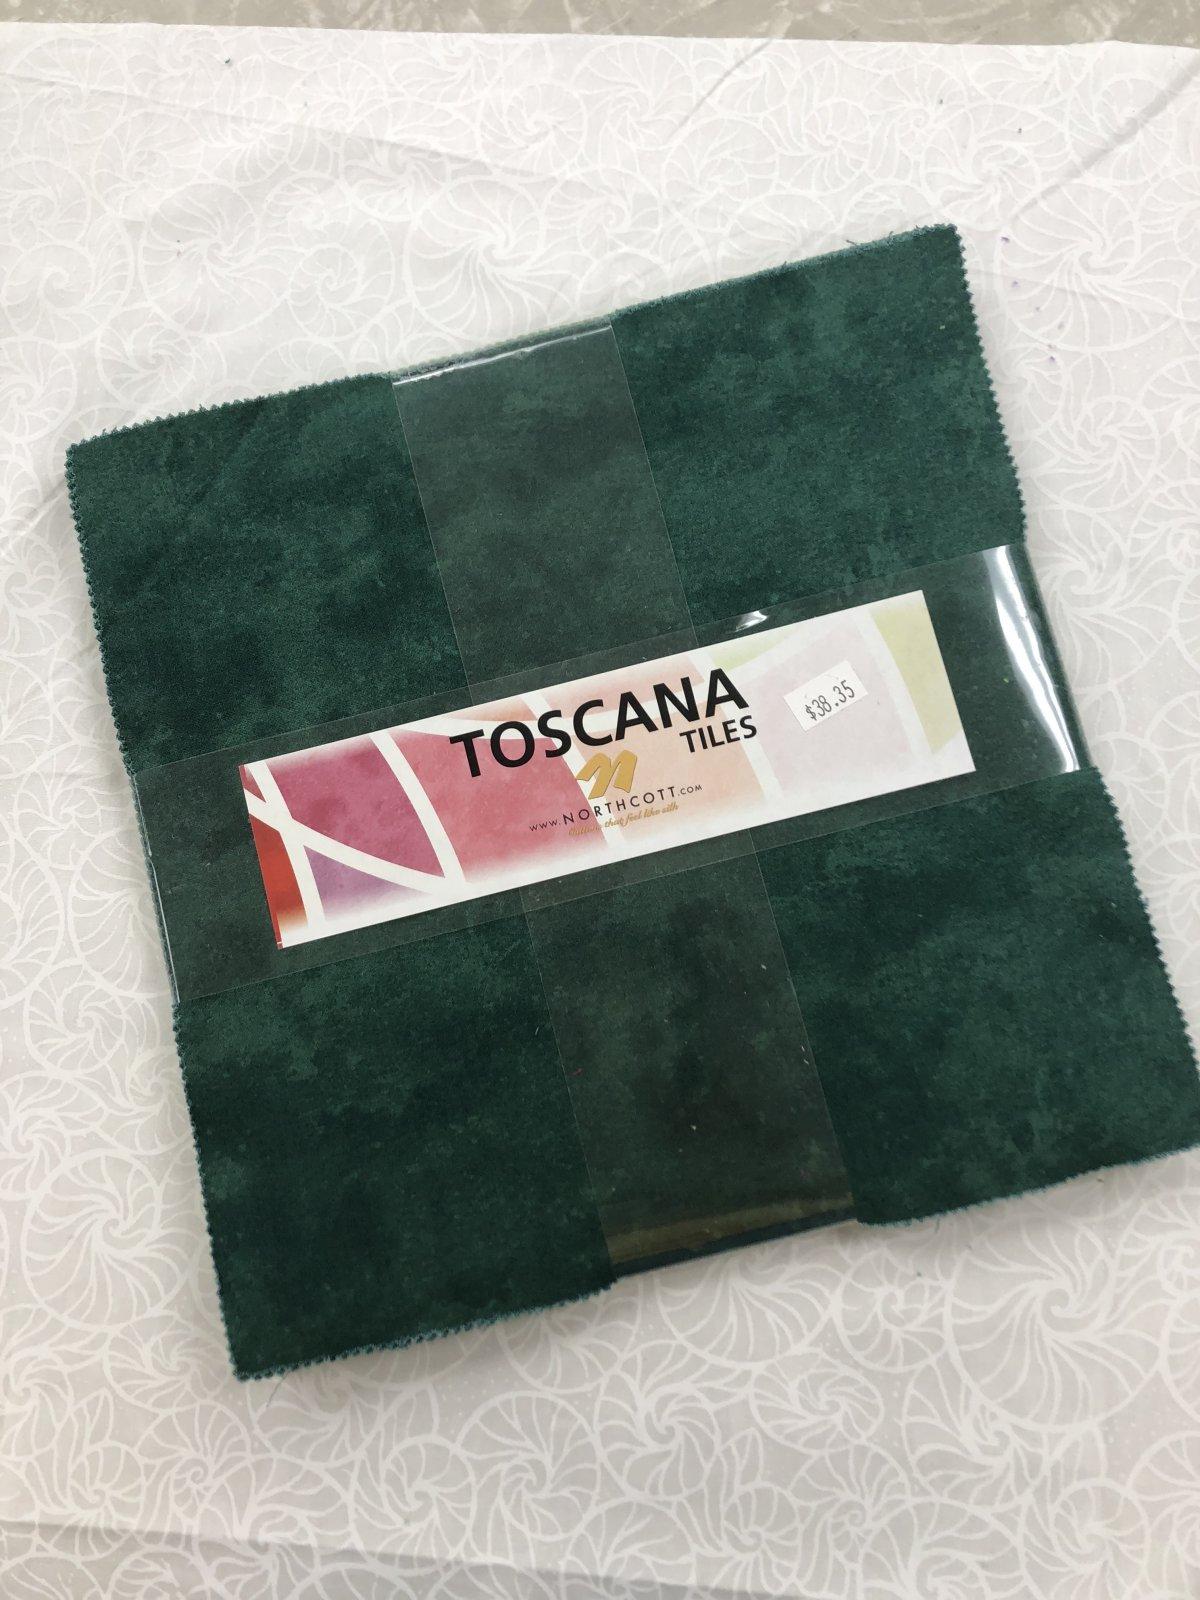 Toscana Rainforest Tiles 42 10in sq.